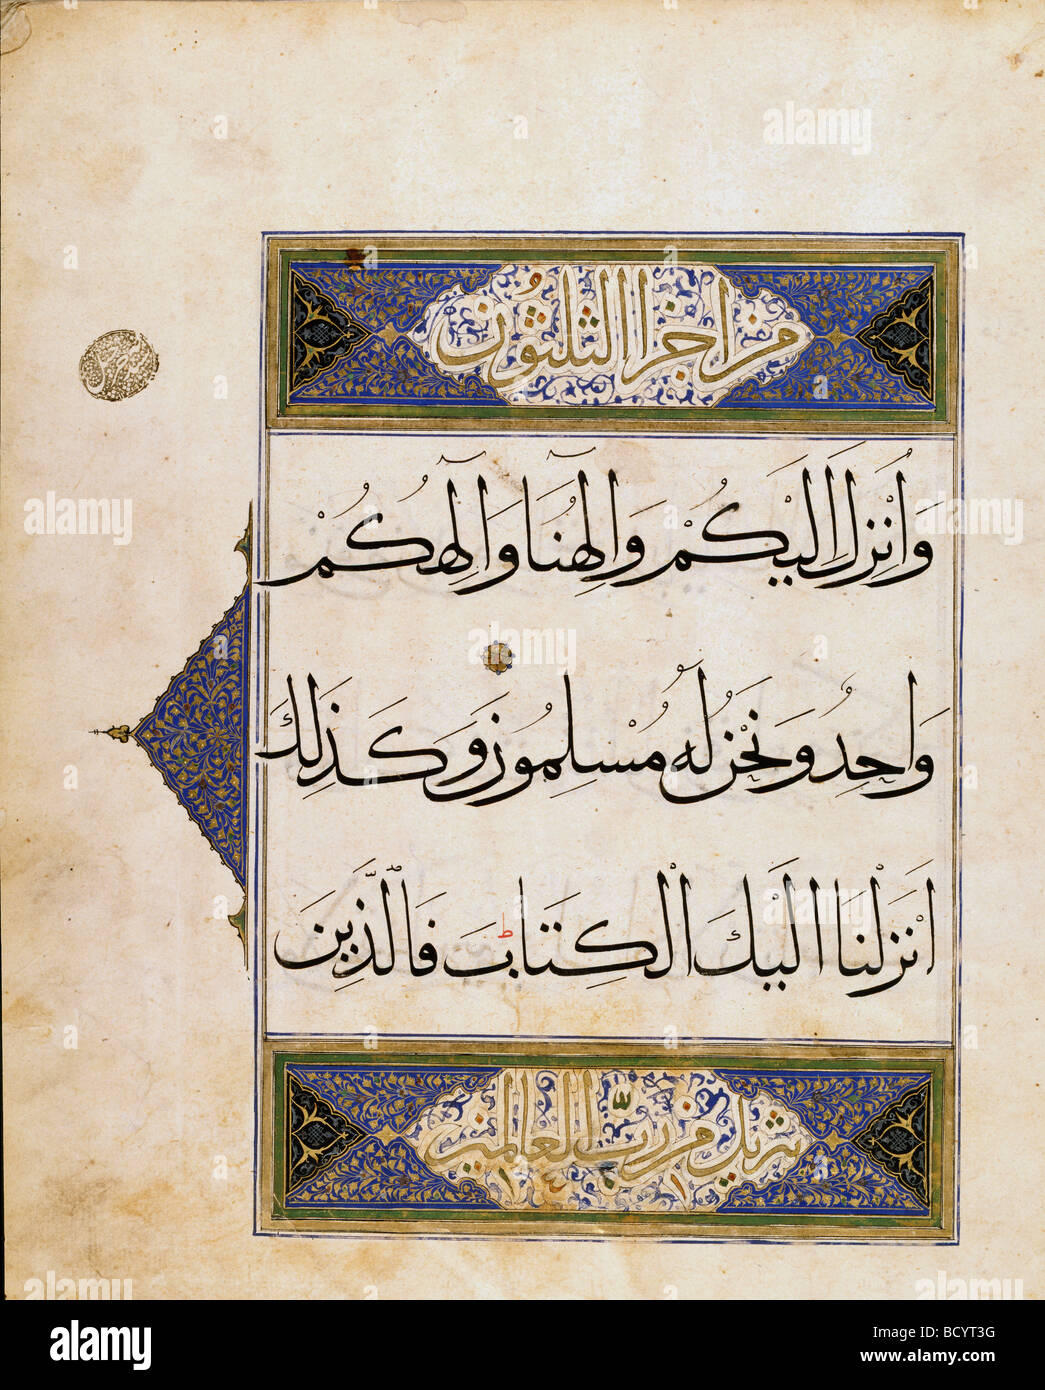 The Koran. Egypt, 15th century - Stock Image